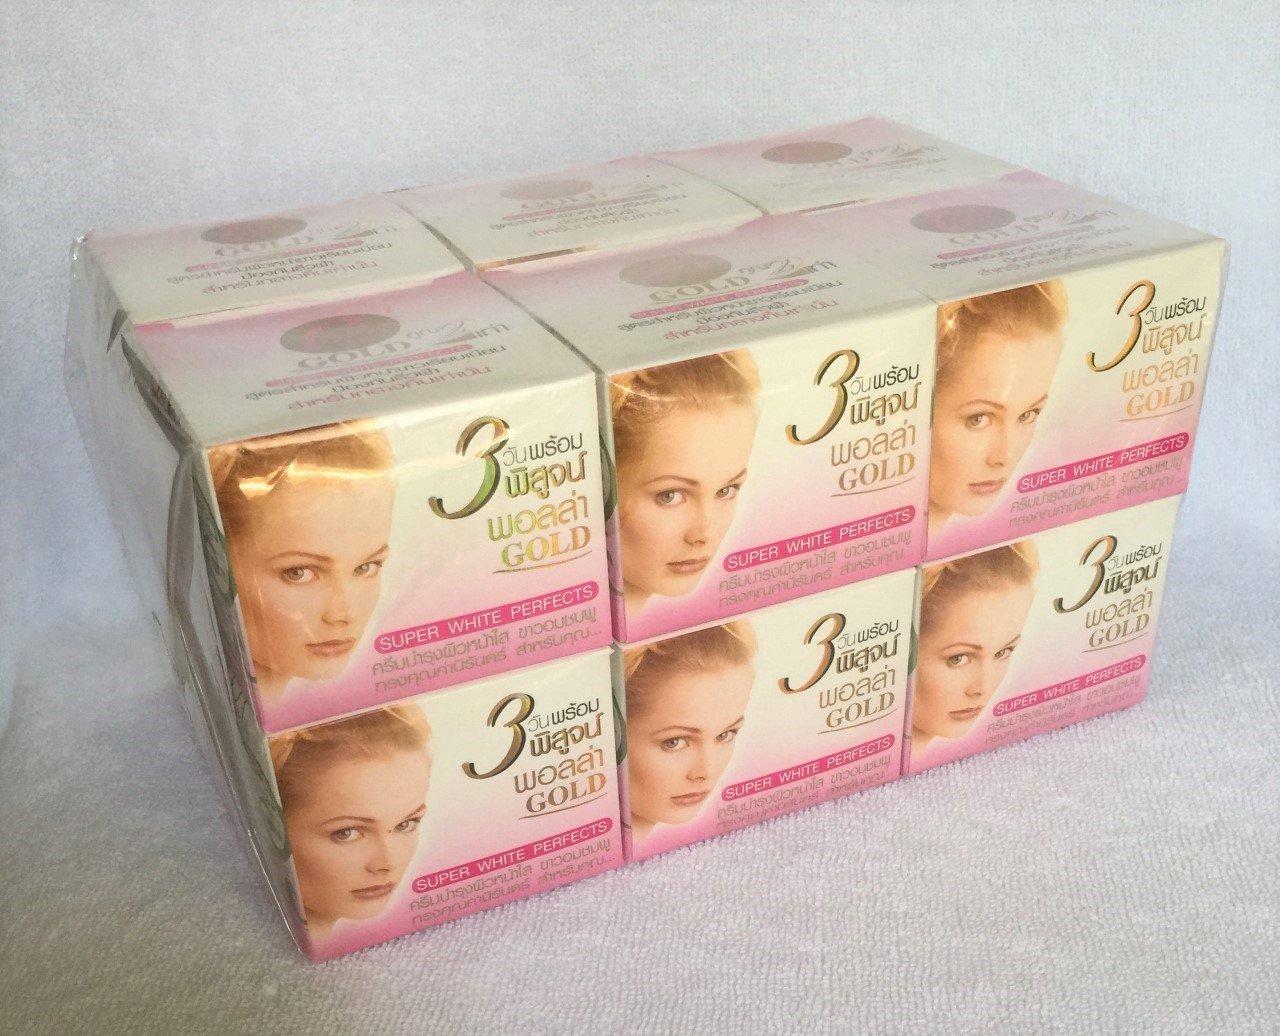 12 PCS of Polla GOLD Super White Perfects Skin Whitening Acne Melasma Night Cream 10g./0.35oz.